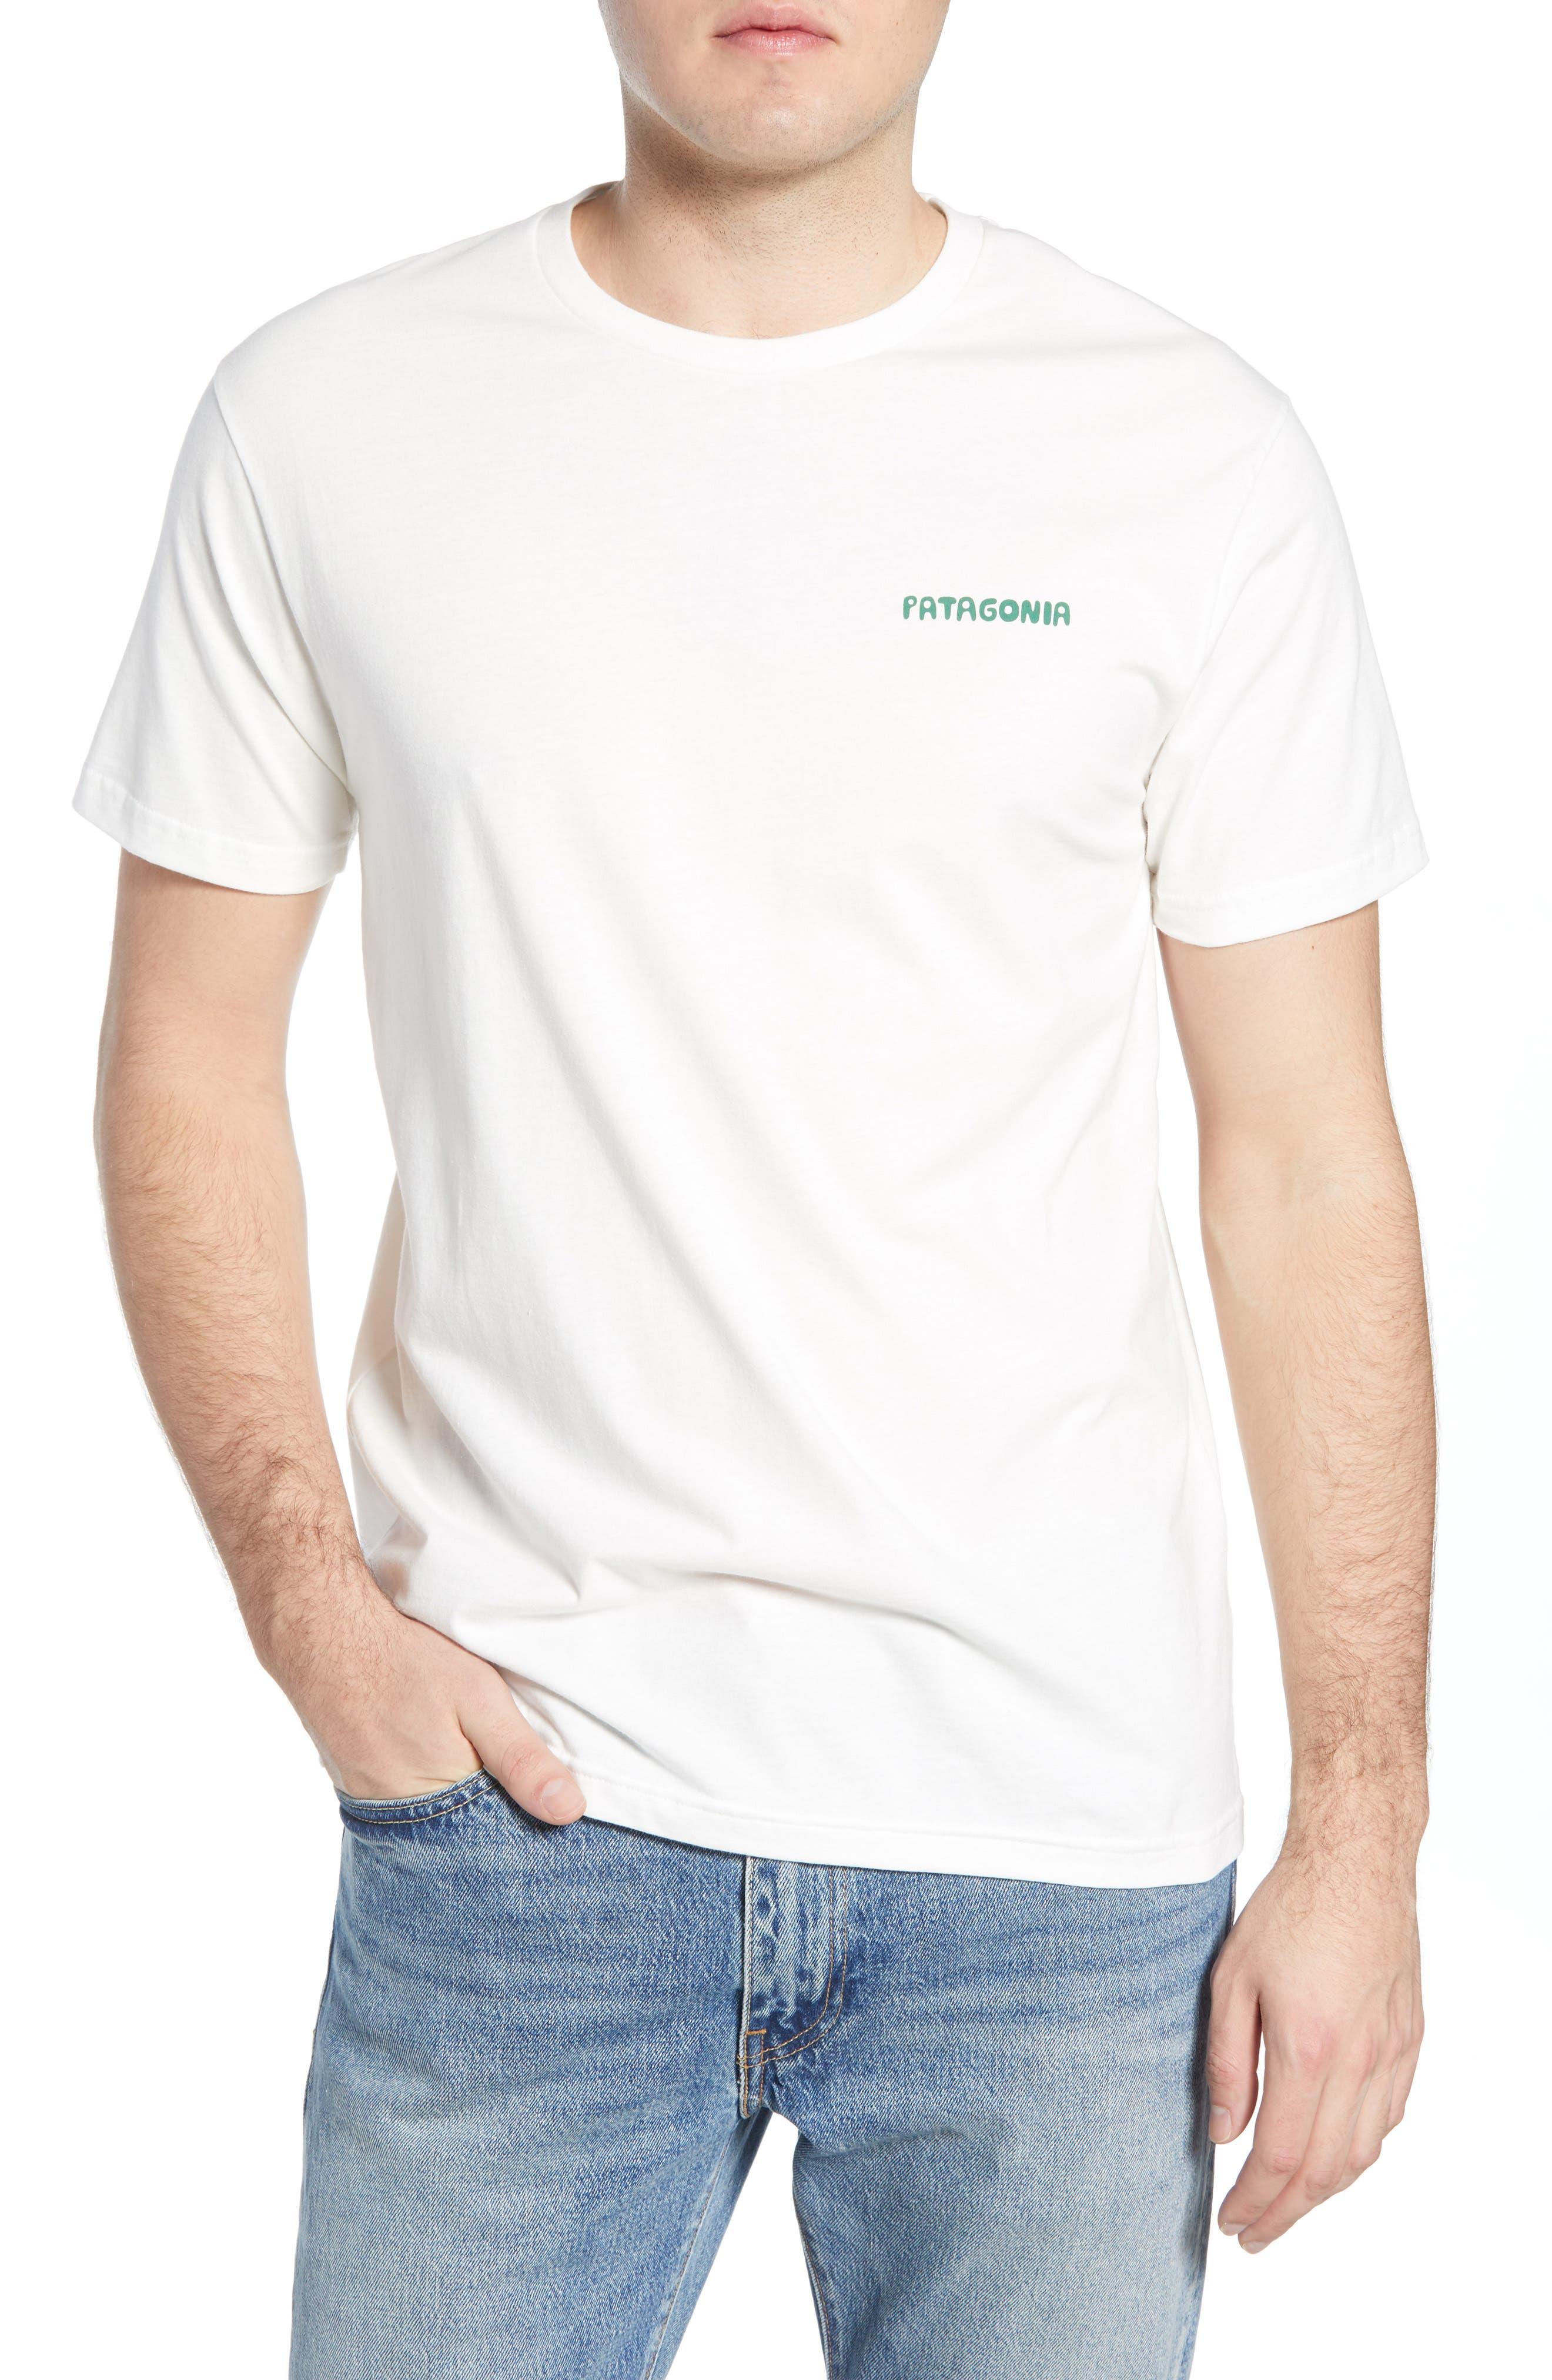 Patagonia Stand Up Graphic Organic Cotton T-Shirt, White